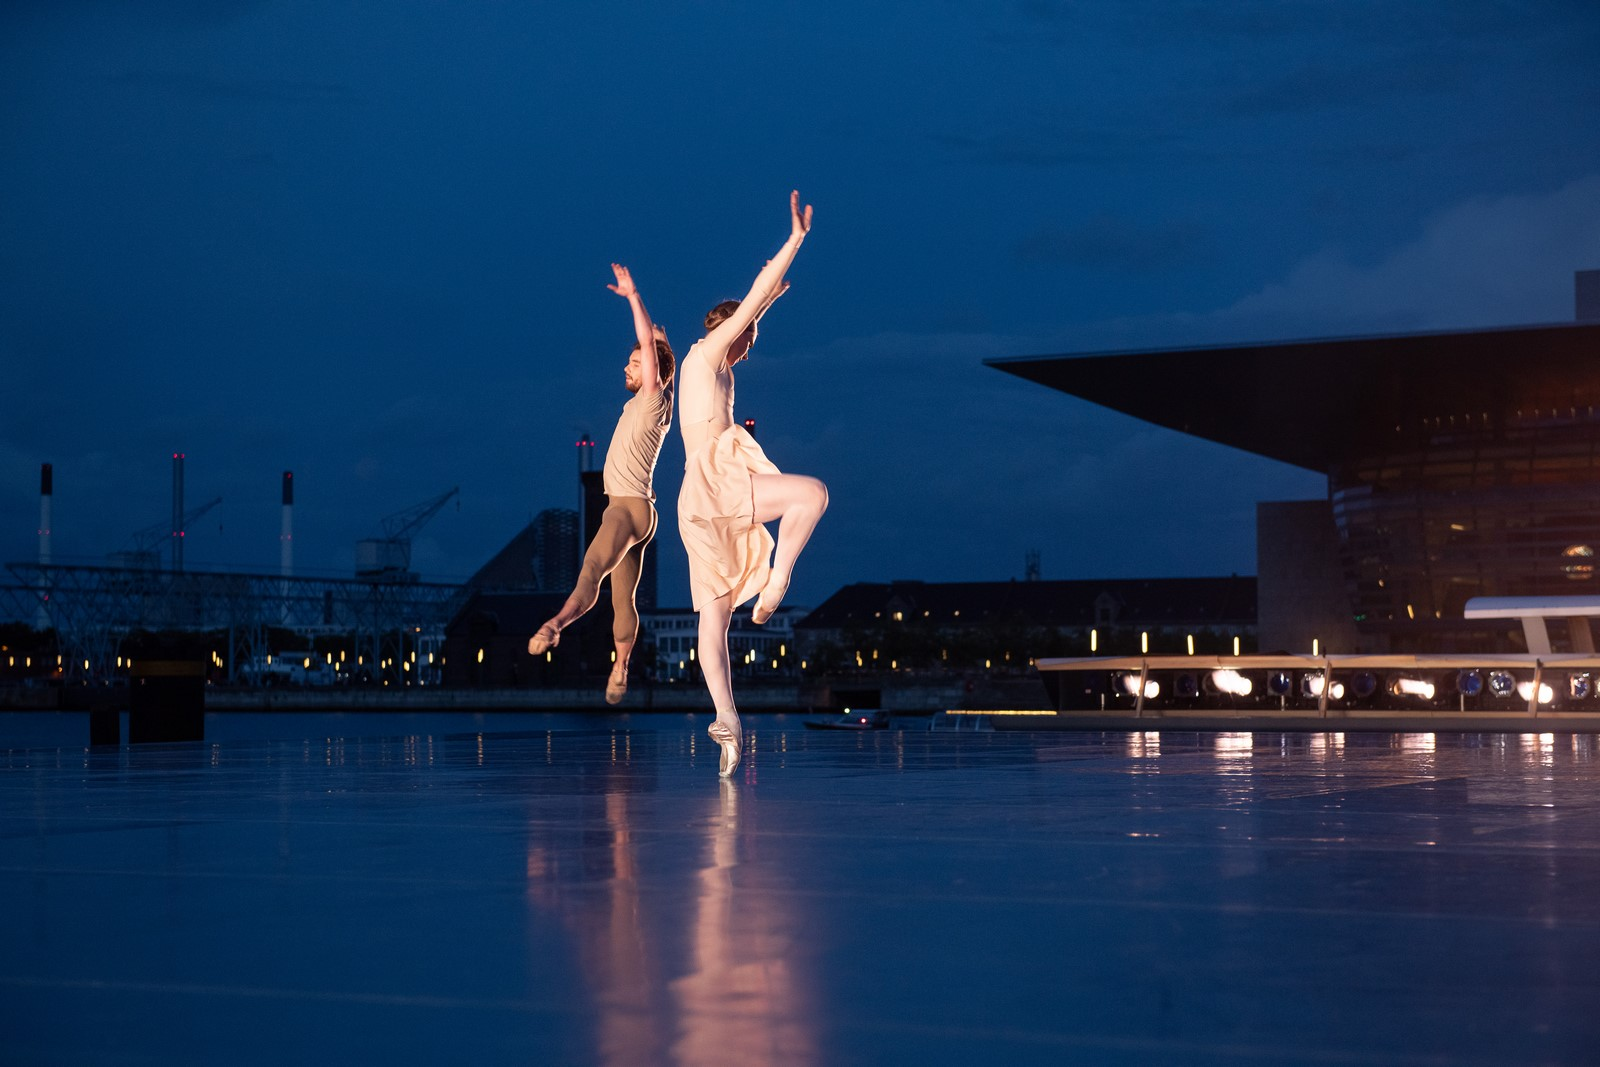 Anmeldelse: Copenhagen Summer Dance, Ofelia Plads (Dansk Danseteater)